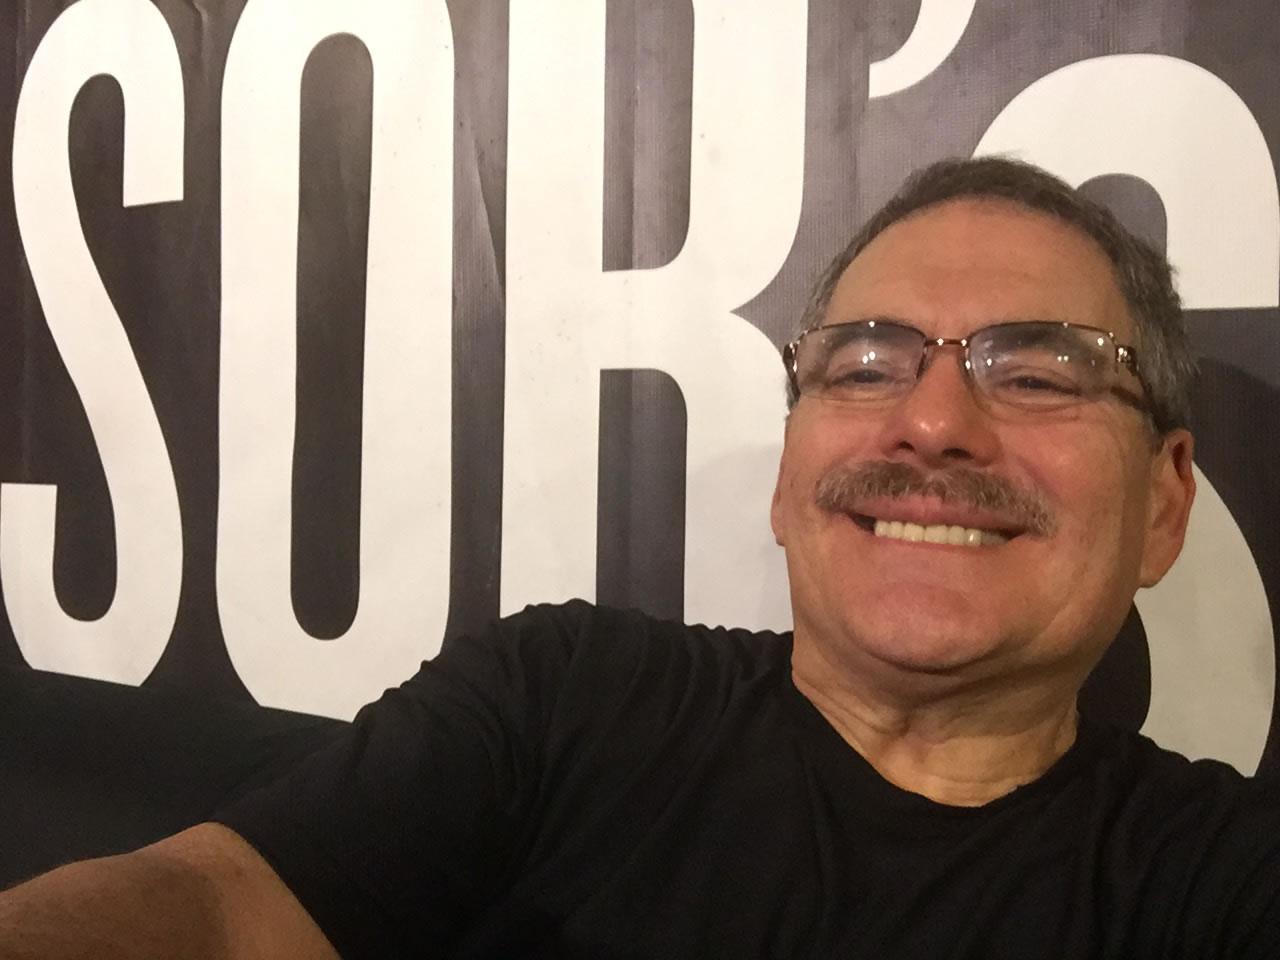 Juanma-selfie-backdrop-backstage-SOB's-NYC-nightclub